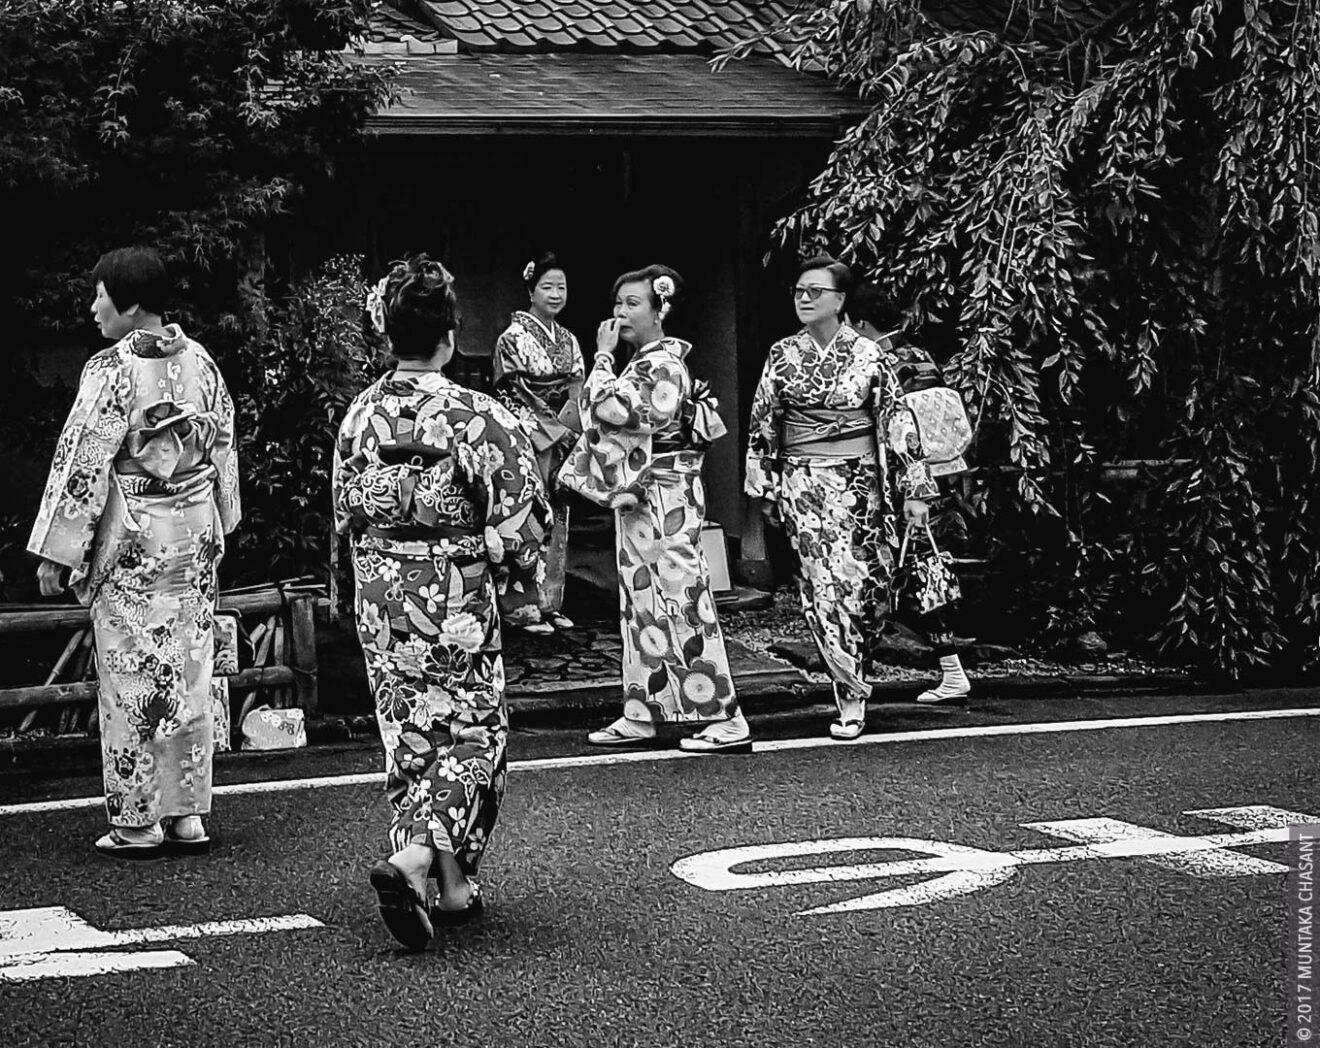 Women wearing kimono Photo in Kyoto, Japan, by Muntaka Chasant